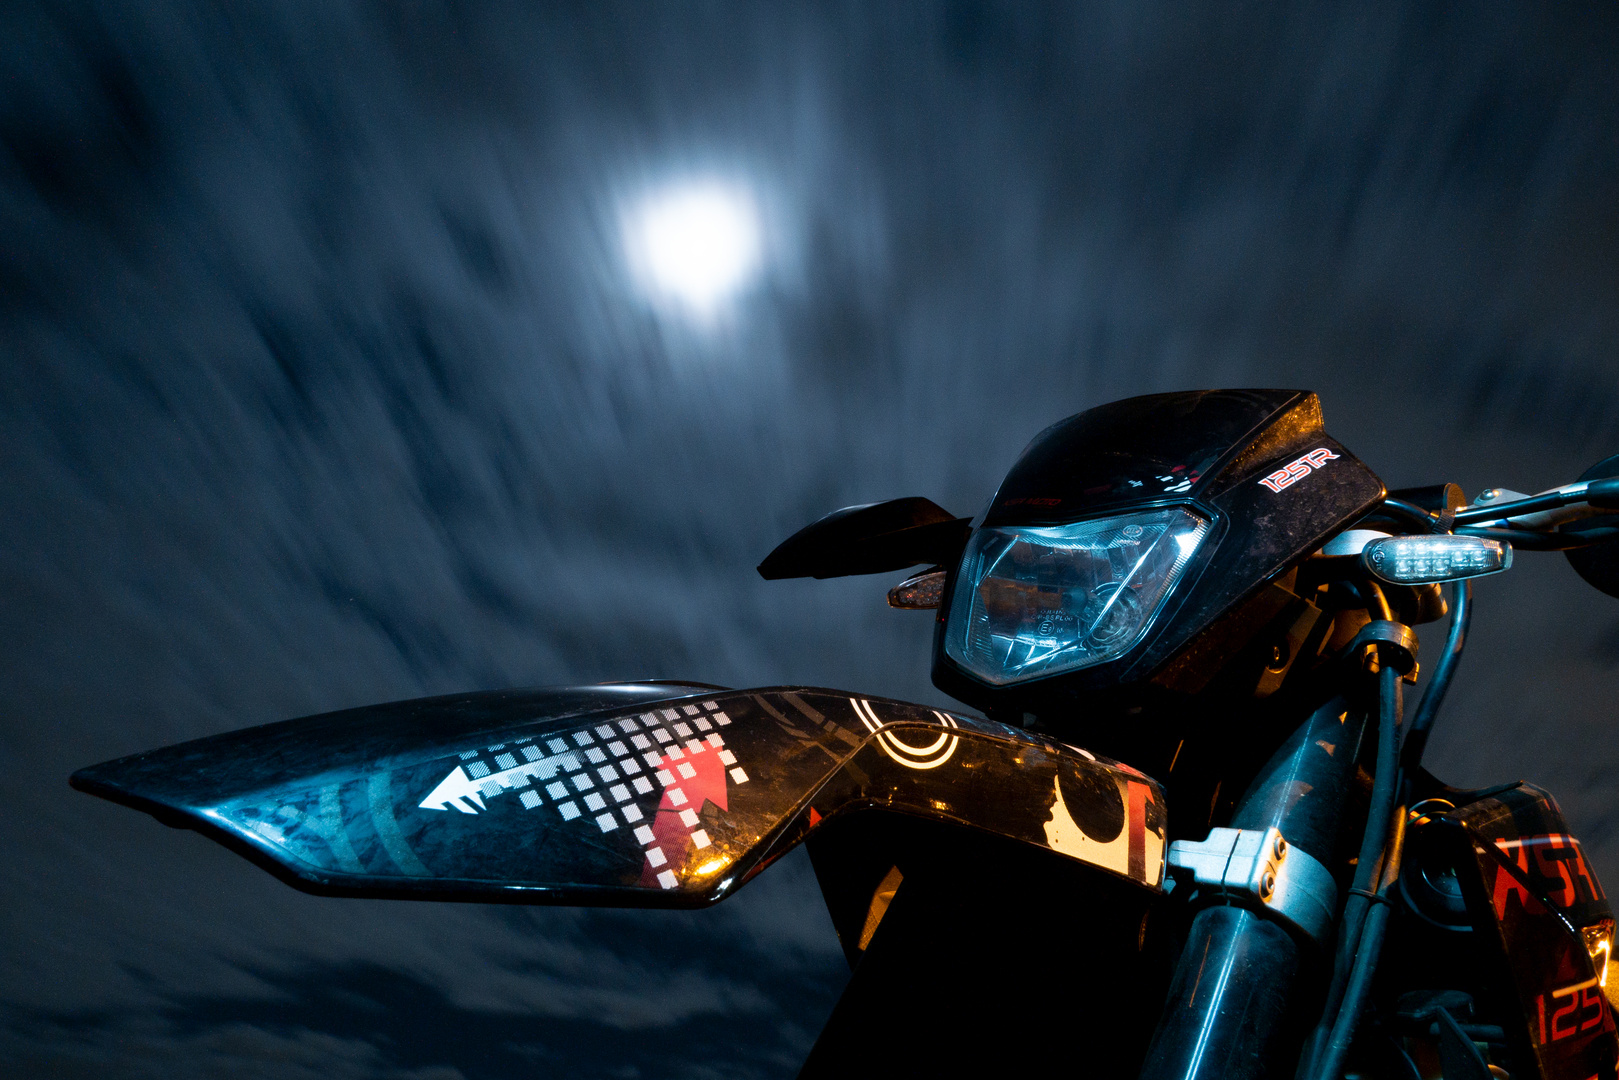 Motorrad bei Nacht